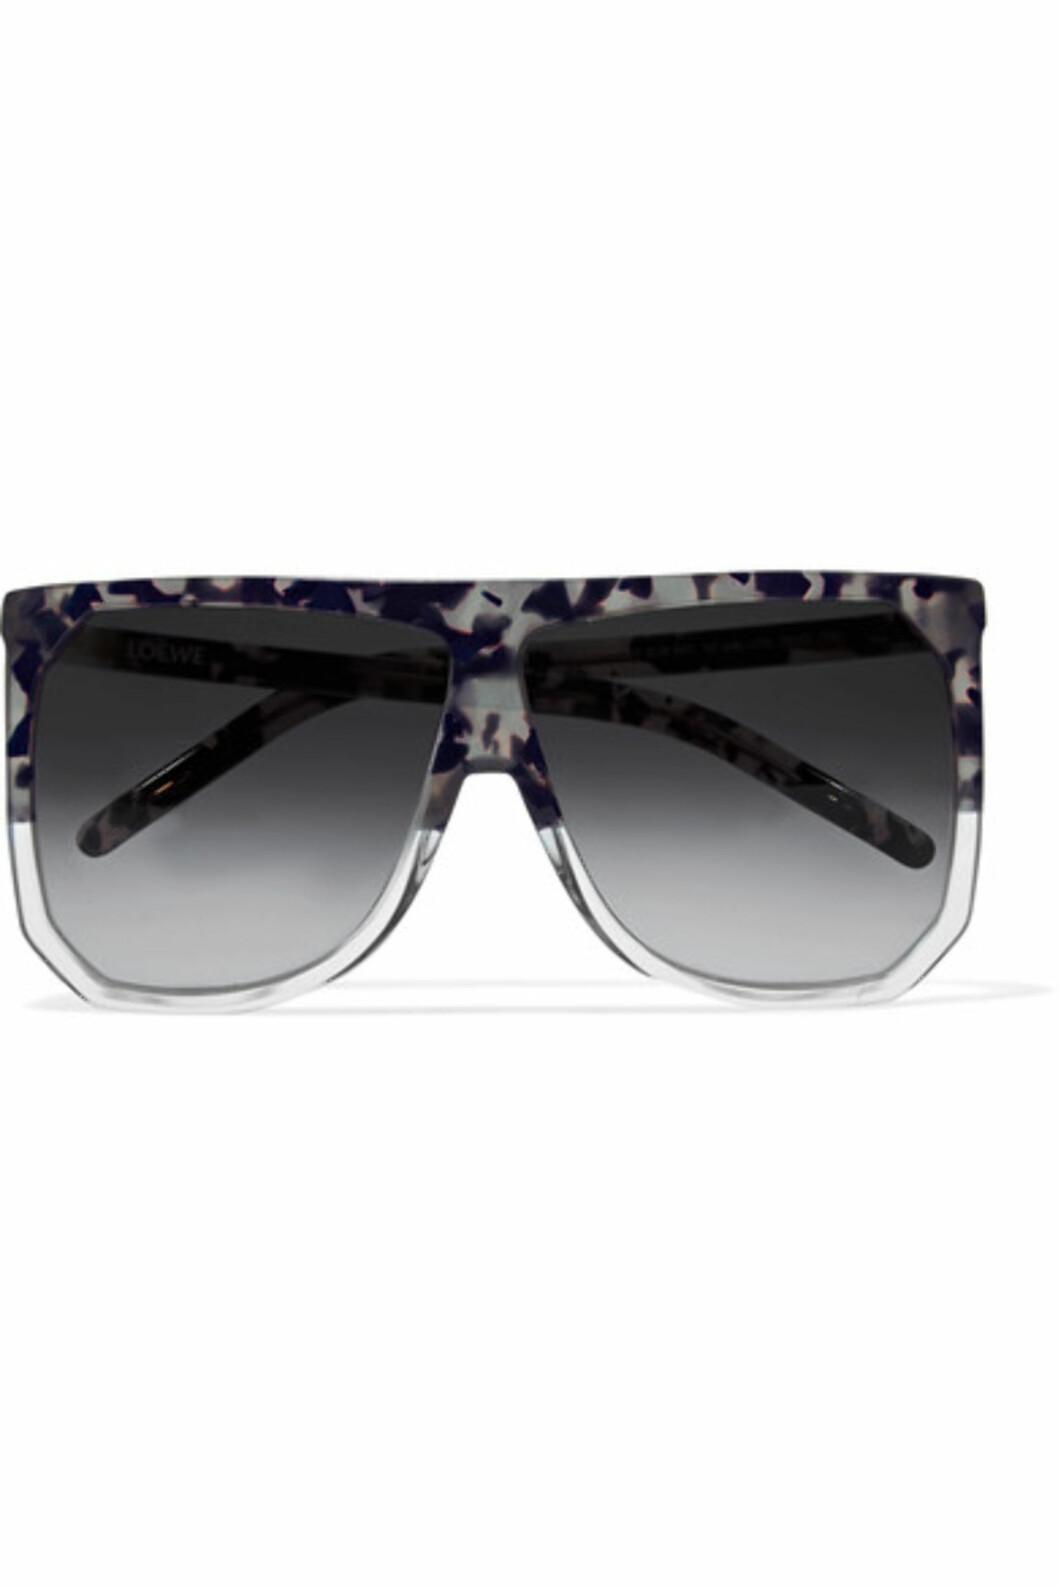 Solbriller fra Loewe via Net-a-porter.com | kr 3190 | https://www.net-a-porter.com/no/en/product/815225/loewe/filipa-d-frame-acetate-sunglasses